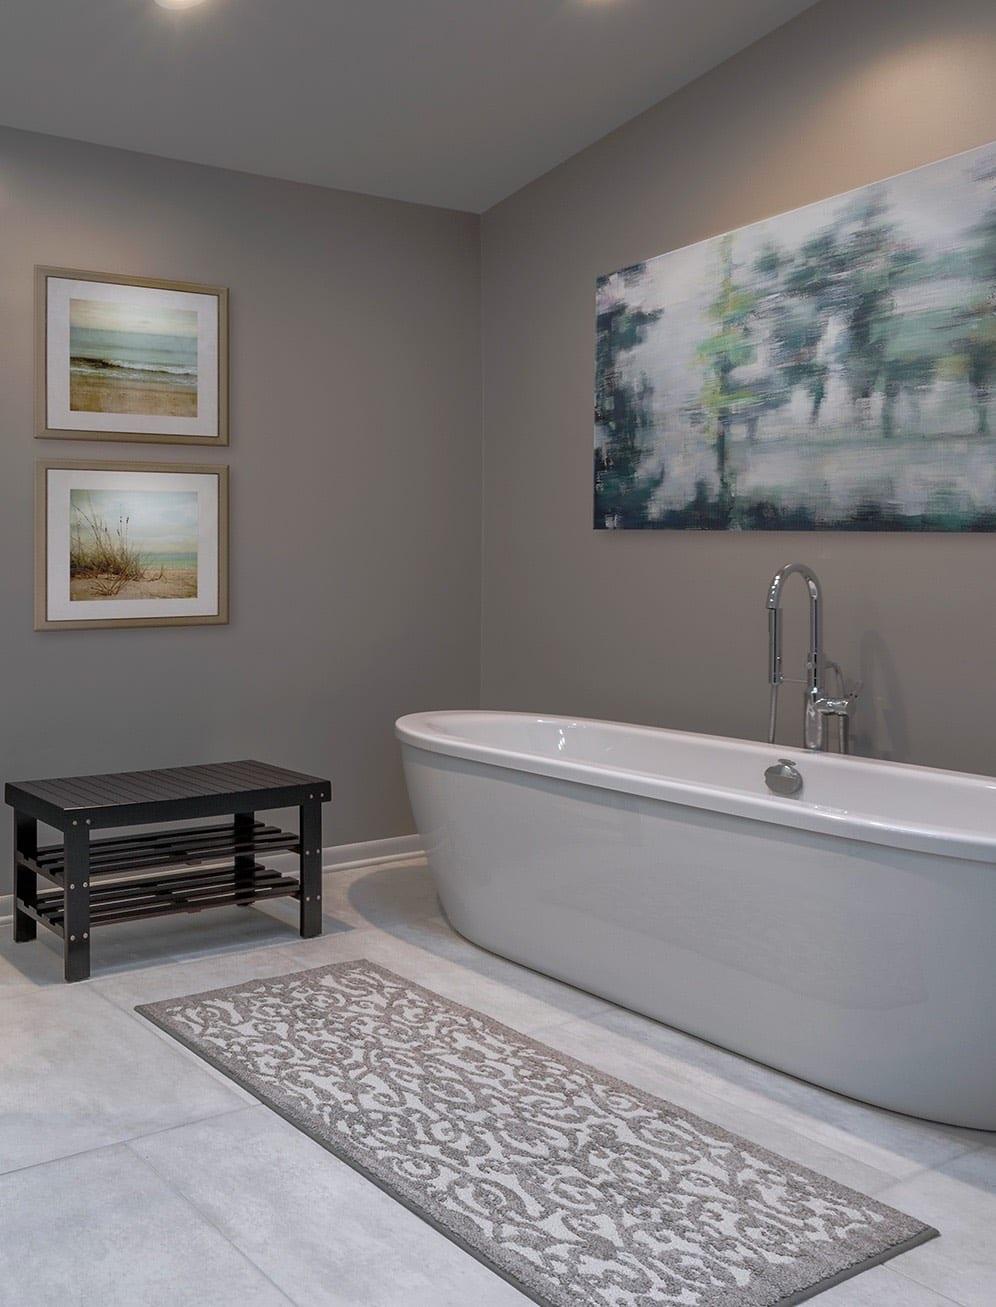 Bathroom Design Soaker Tub